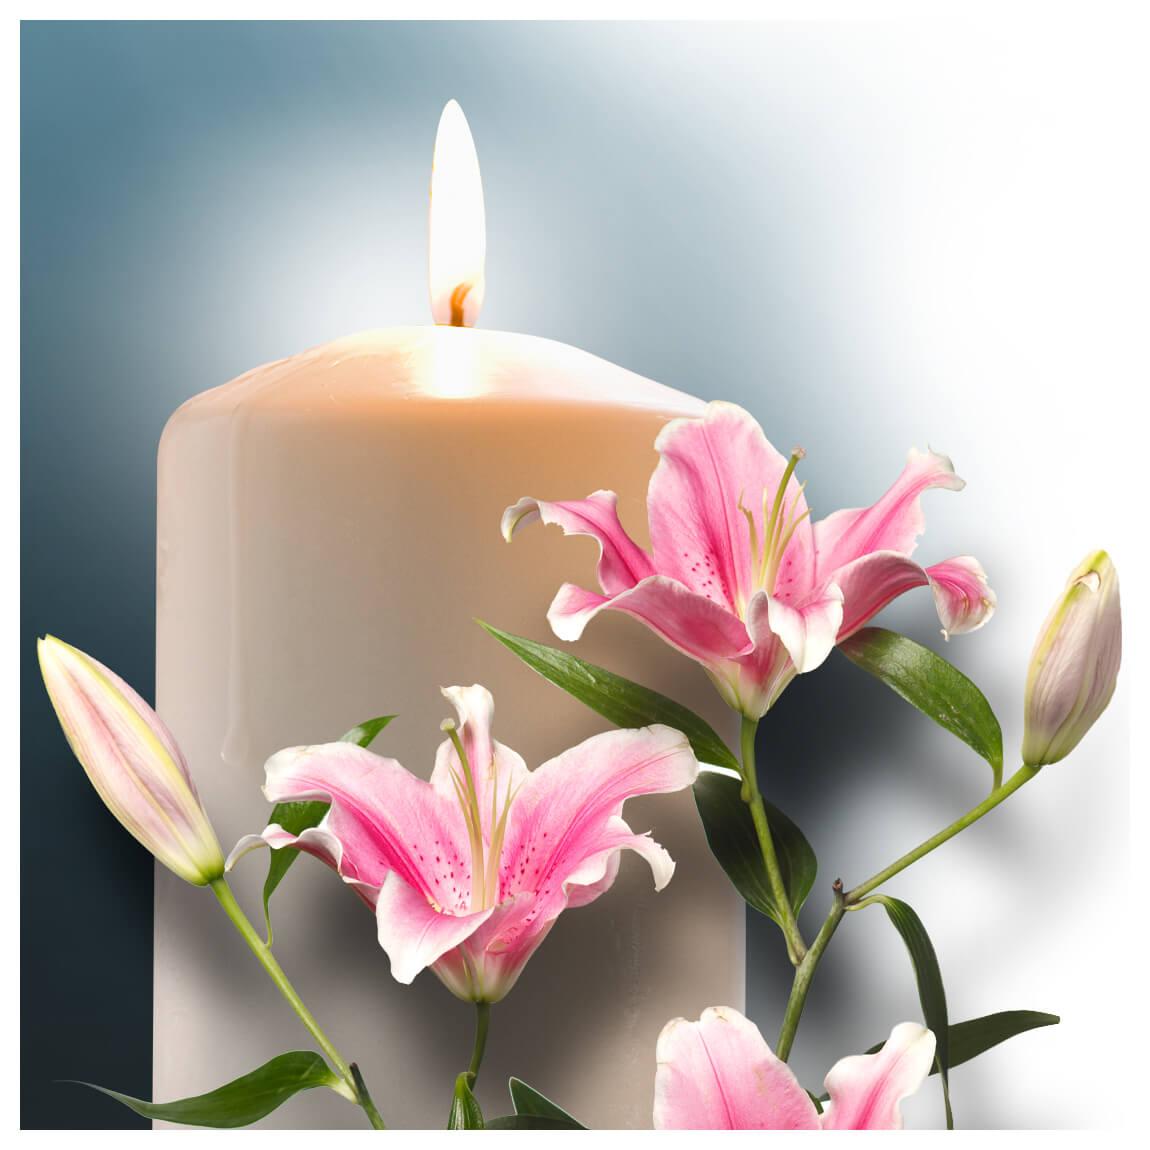 candle-main-image.jpg